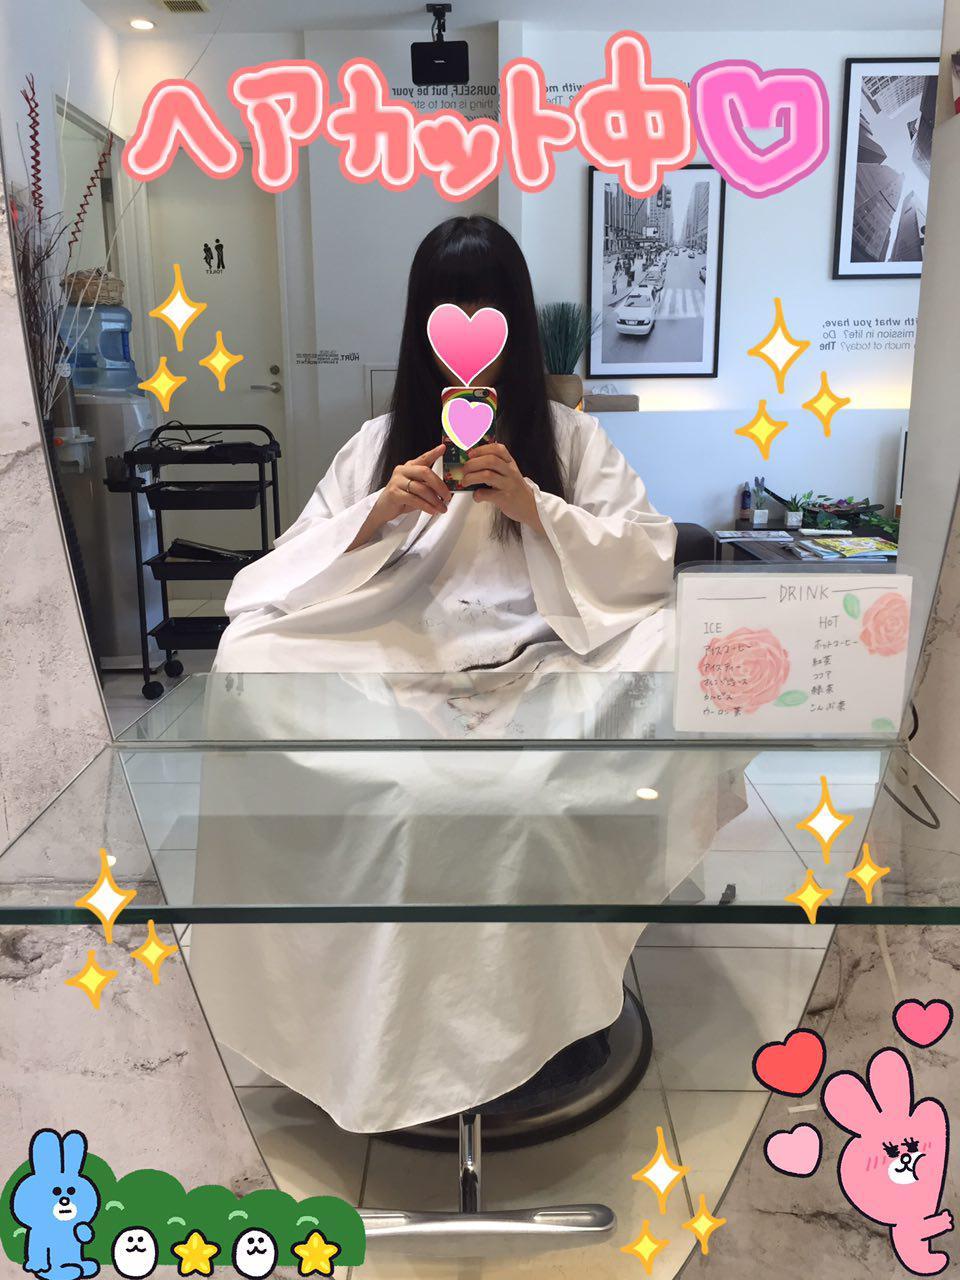 photo_2017-05-28_23-33-49.jpg